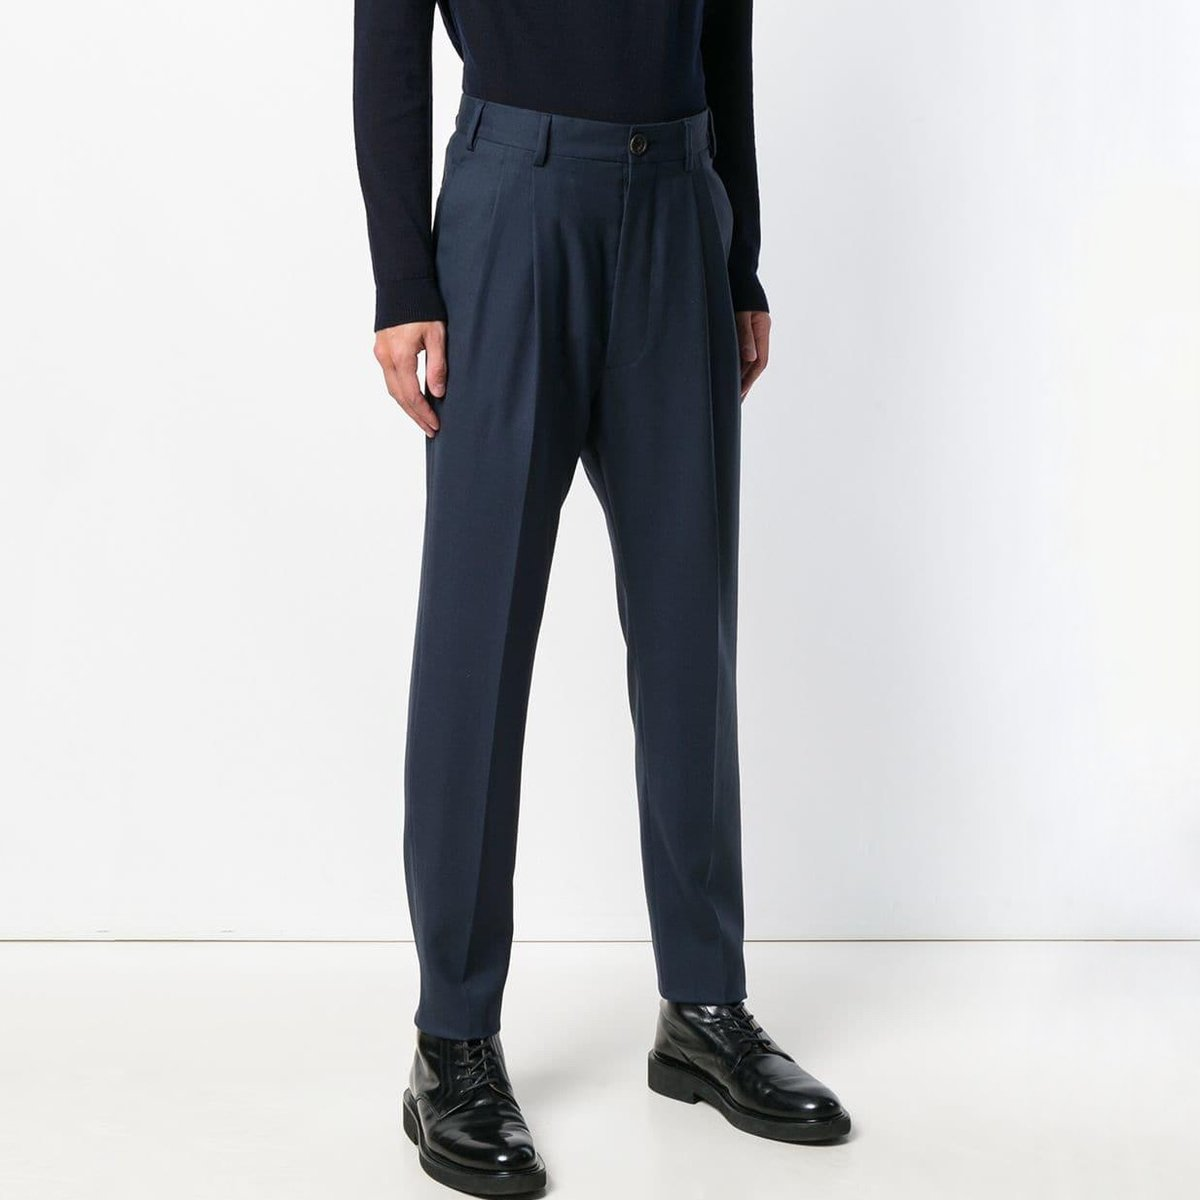 vivienne-westwood-Blue-Tailored-Trousers (2).jpg